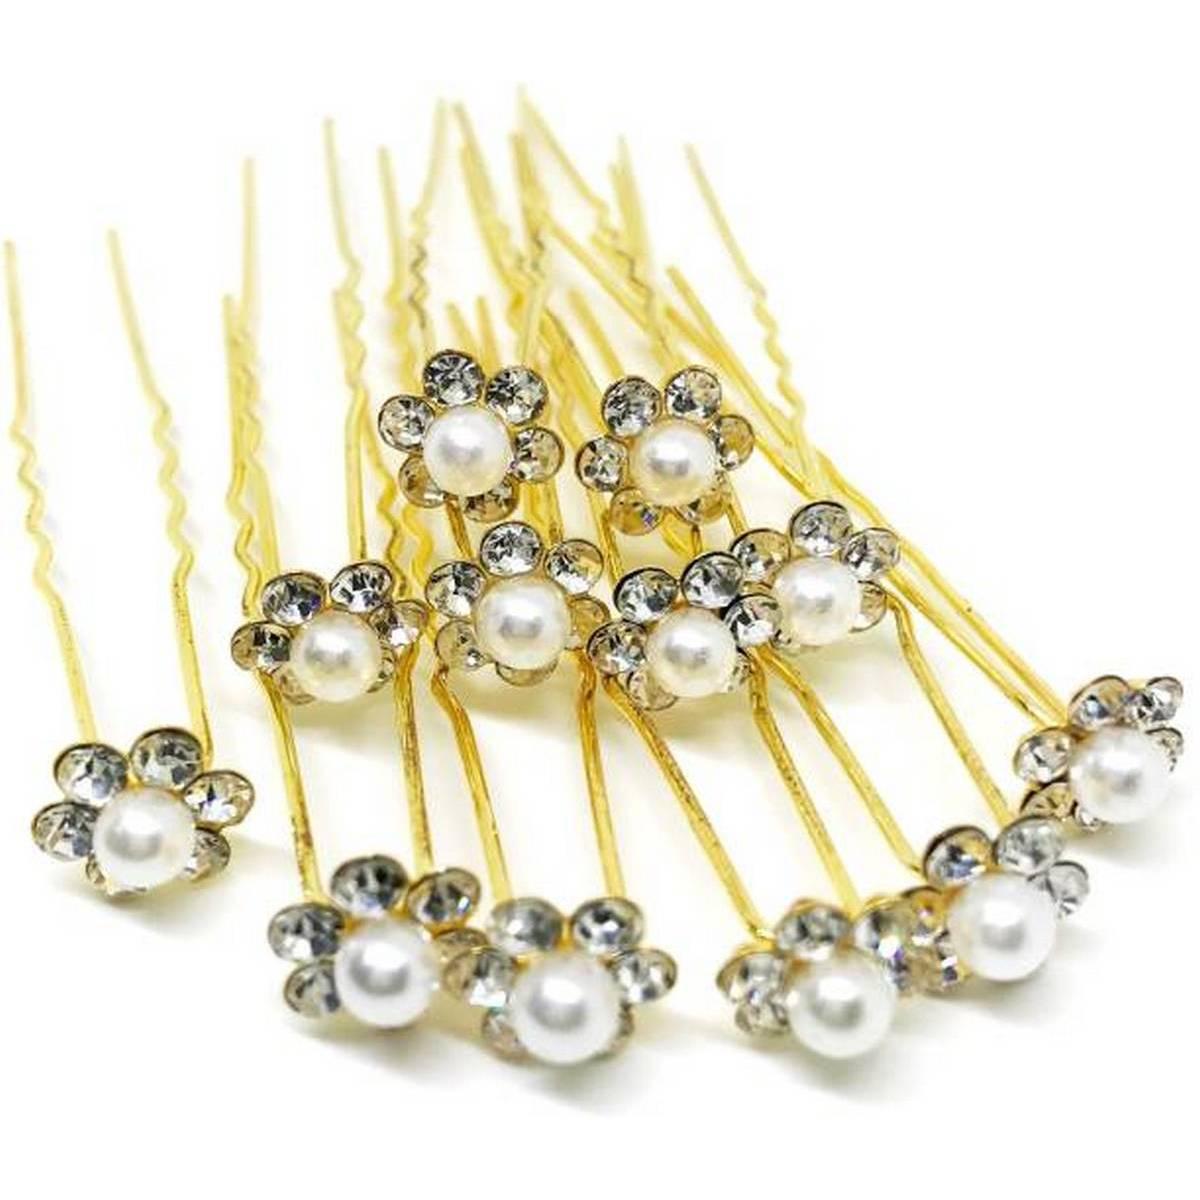 Flower Pearl Victorian Bride Hairpin Wedding Girl's Hair Bobby Pins Party Hair Accessories Hair Pins (Silver)